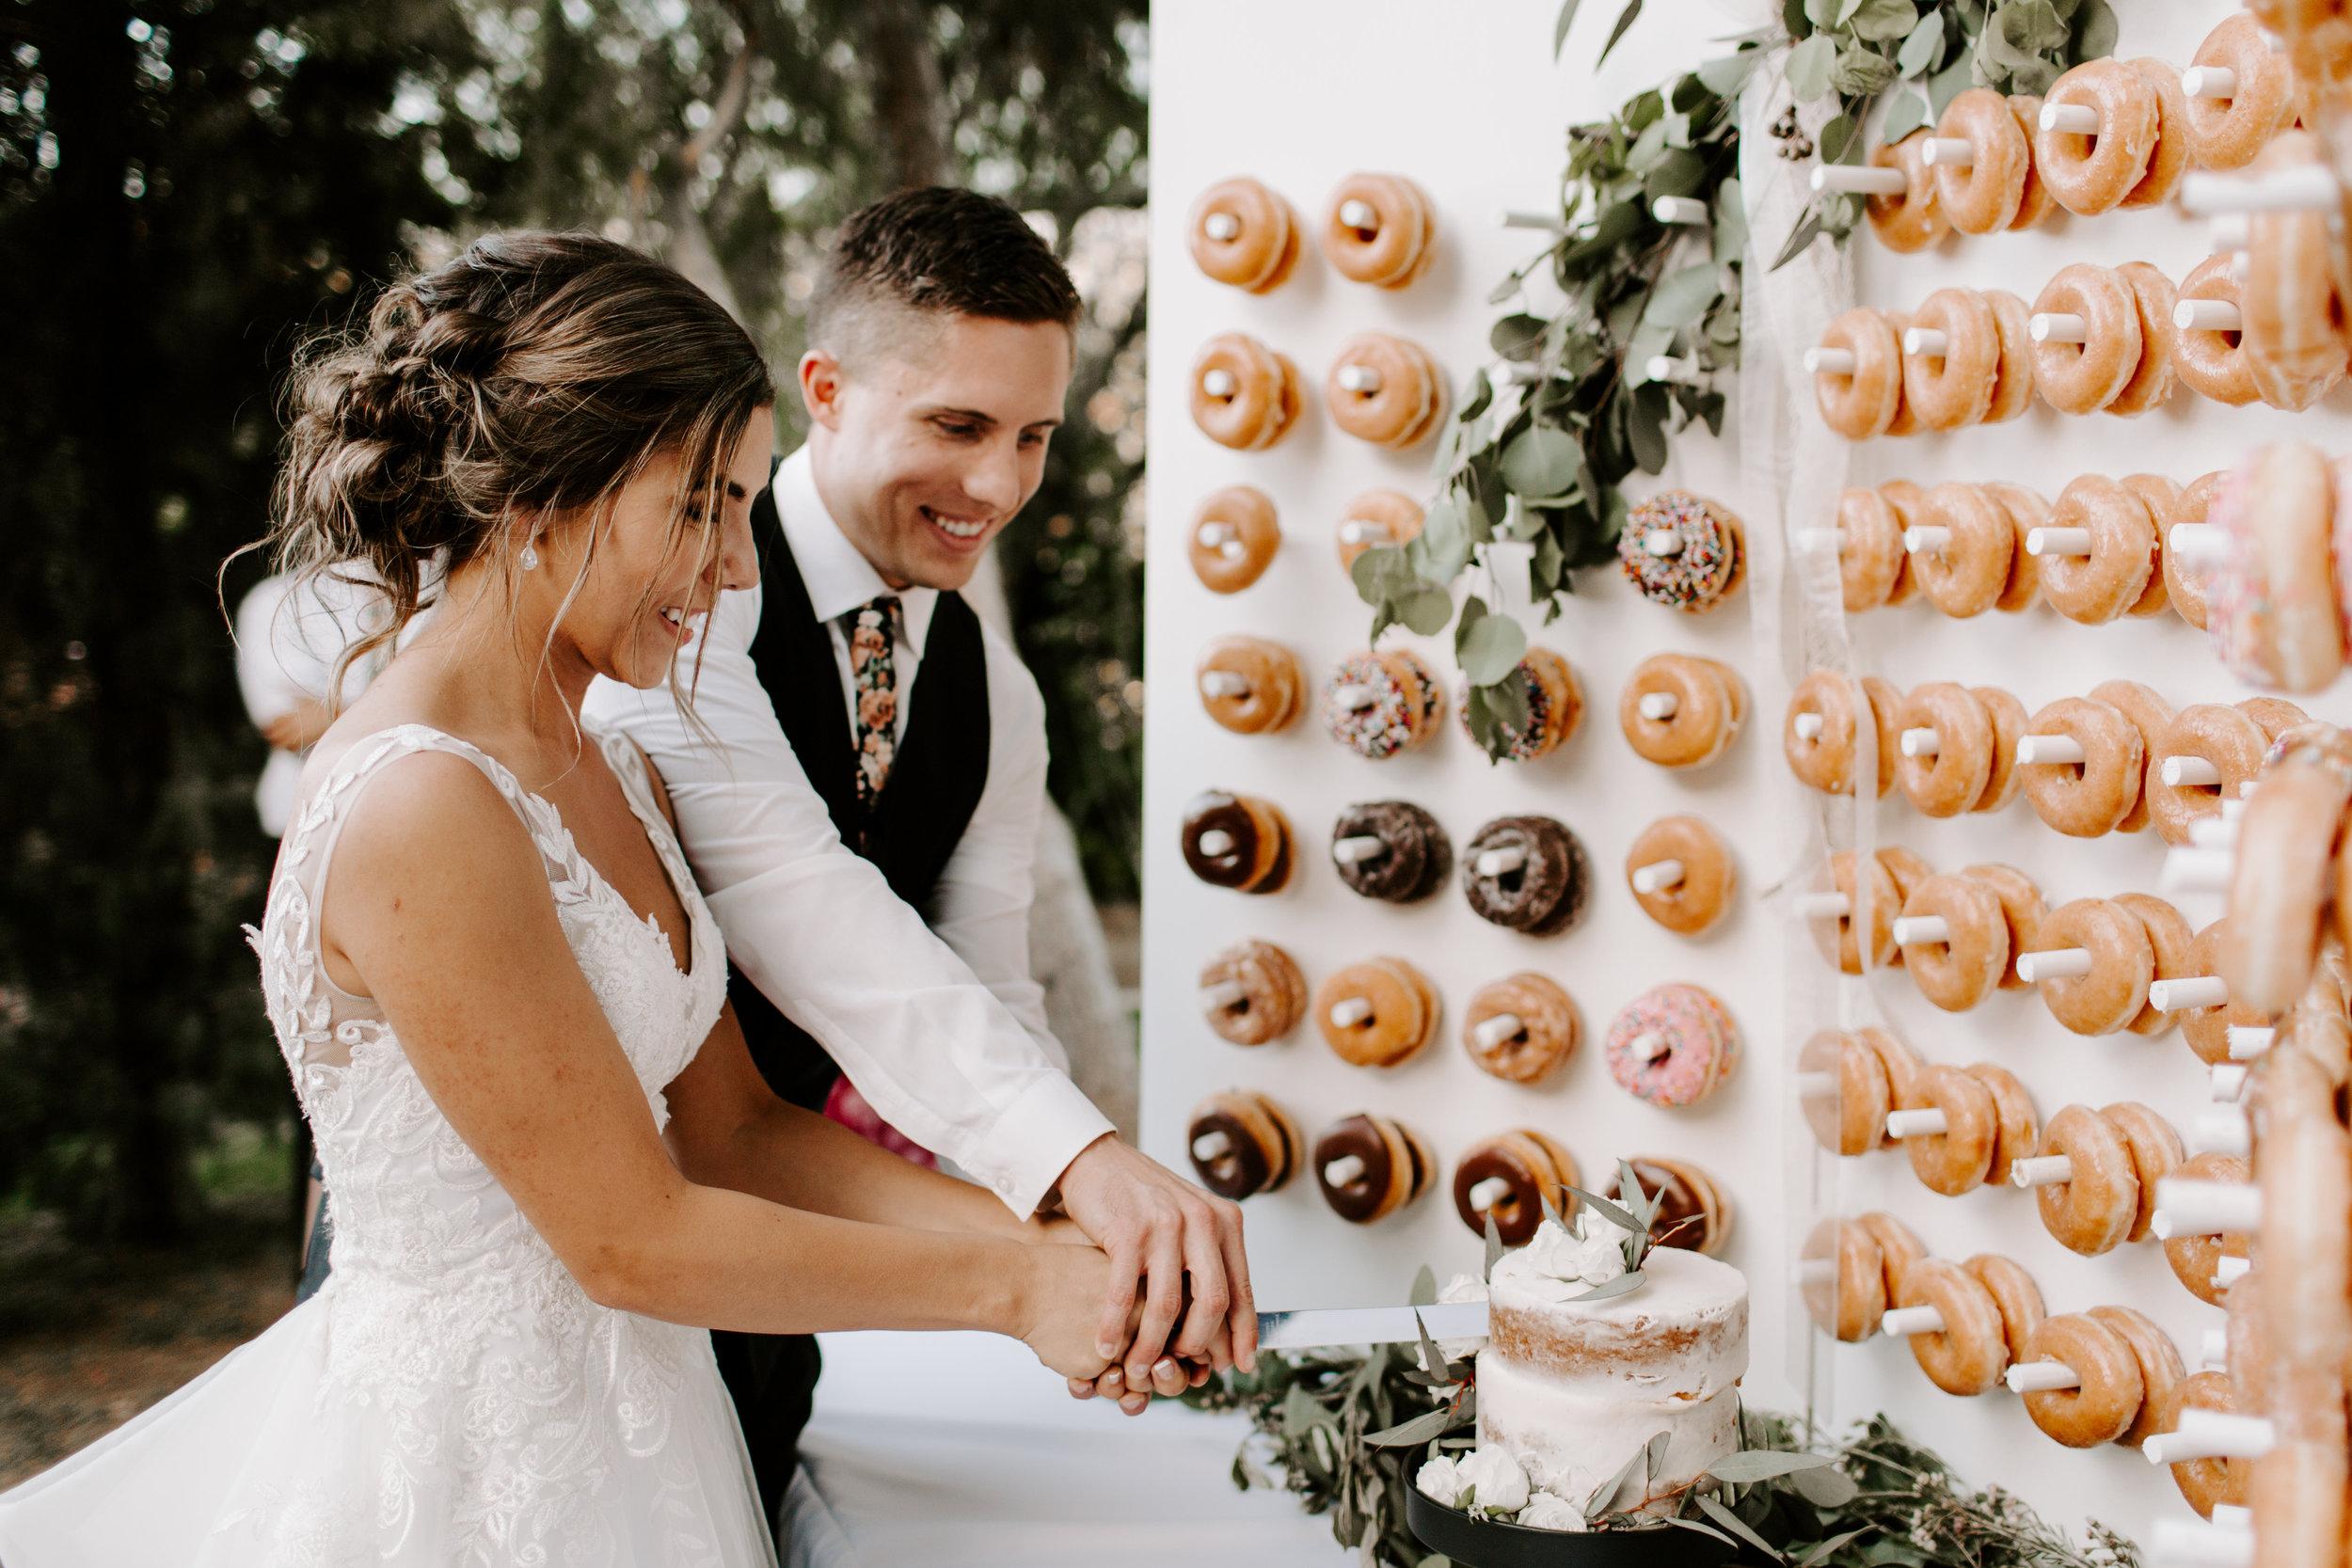 kate+zack_wedding_secludedgardenestate_temecula_madisonrylee_1128.jpg